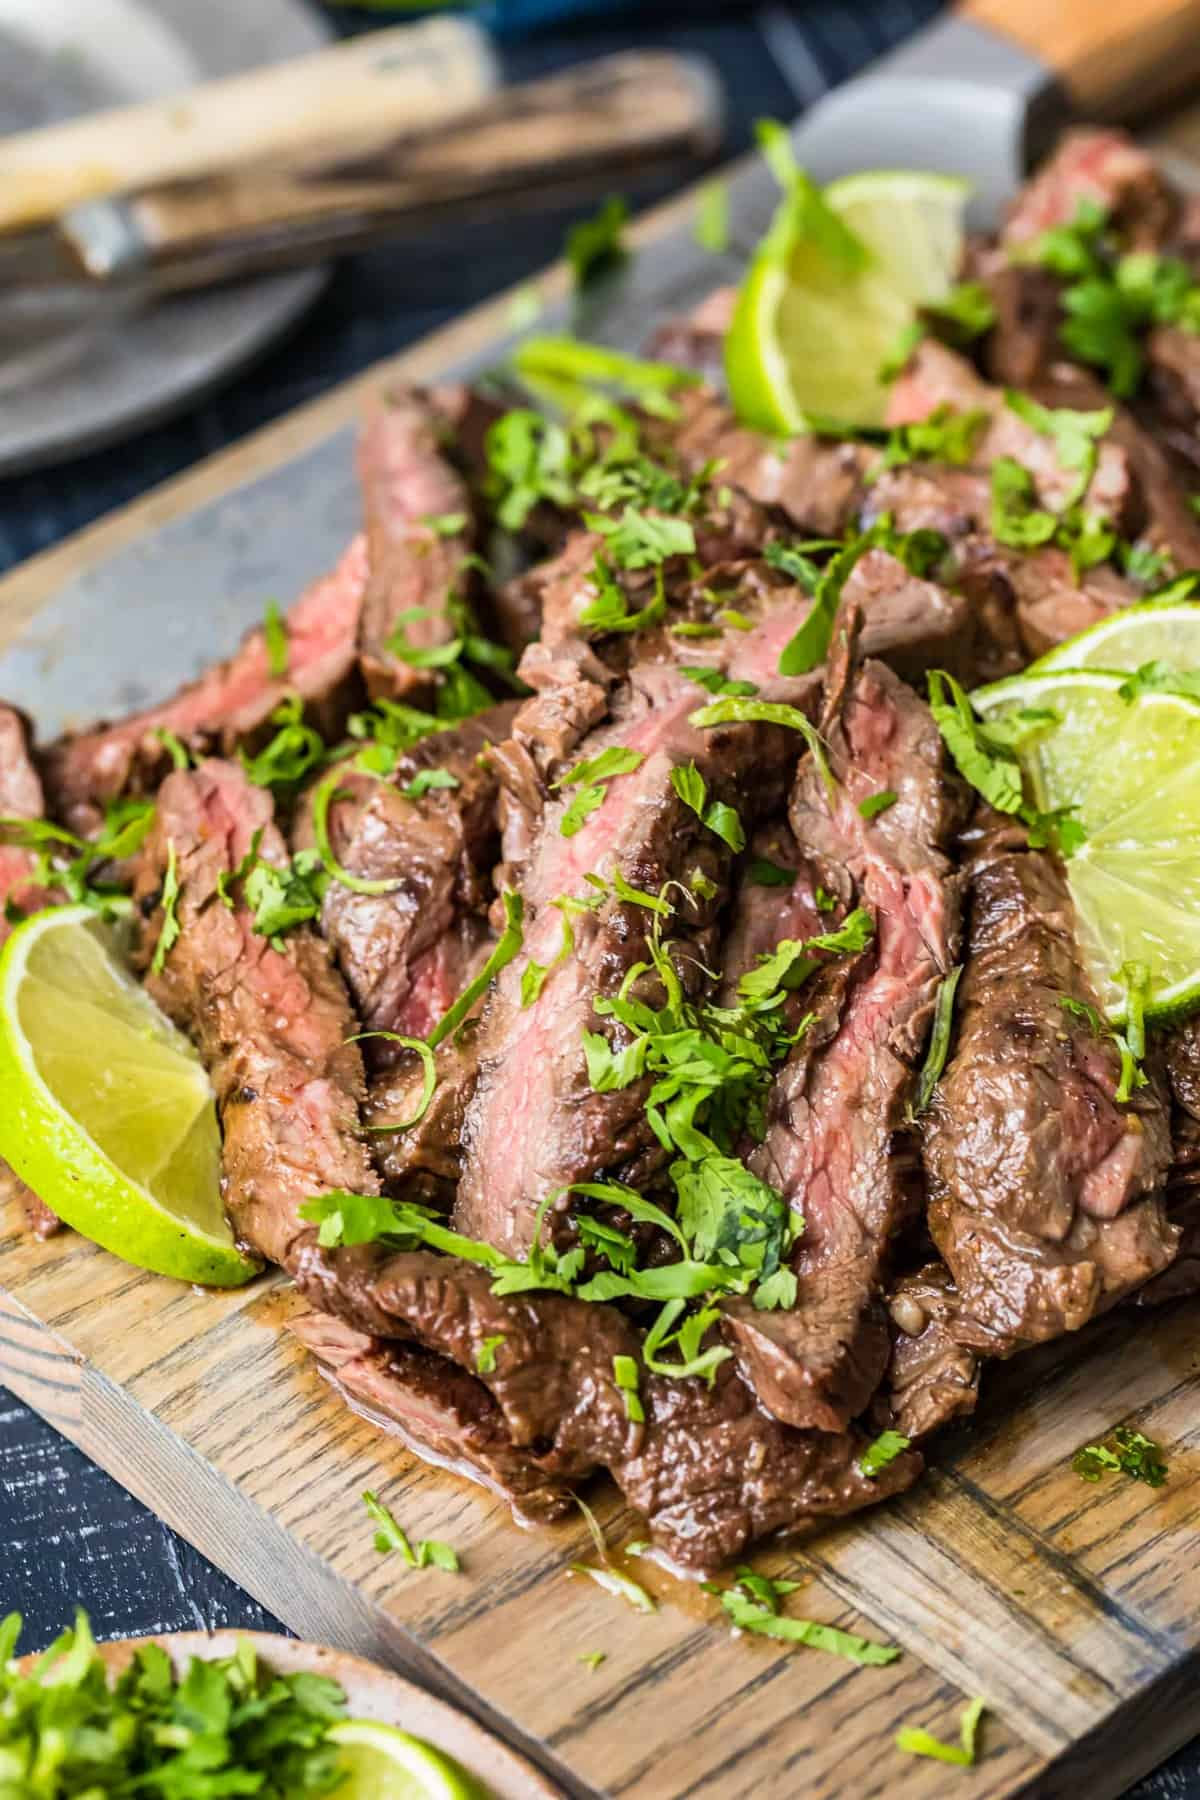 Sliced beef sprinkled with fresh herbs